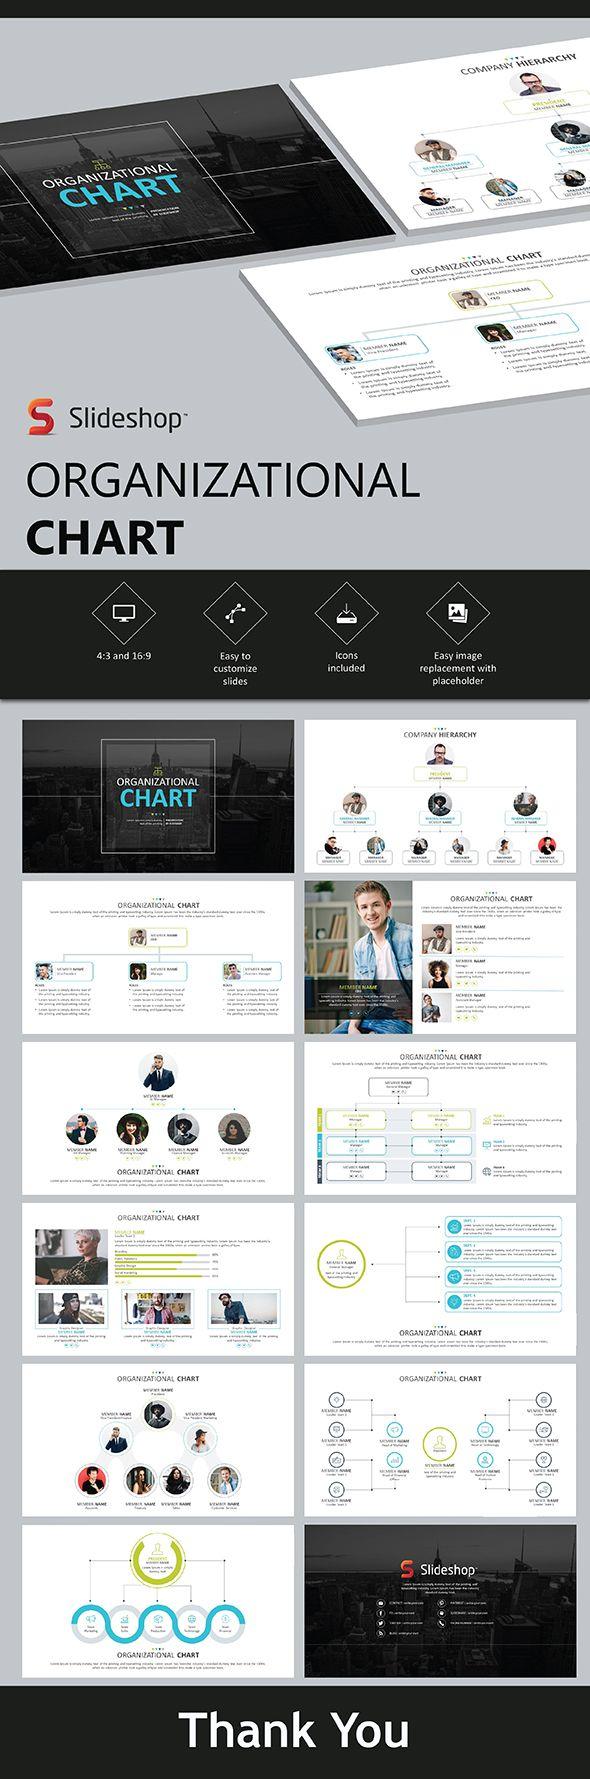 Organizational Chart - PowerPoint Templates Presentation Templates Download here: https://graphicriver.net/item/organizational-chart/19853616?https://graphicriver.net/item/marketing-mix/19853617?ref=classicdesignp